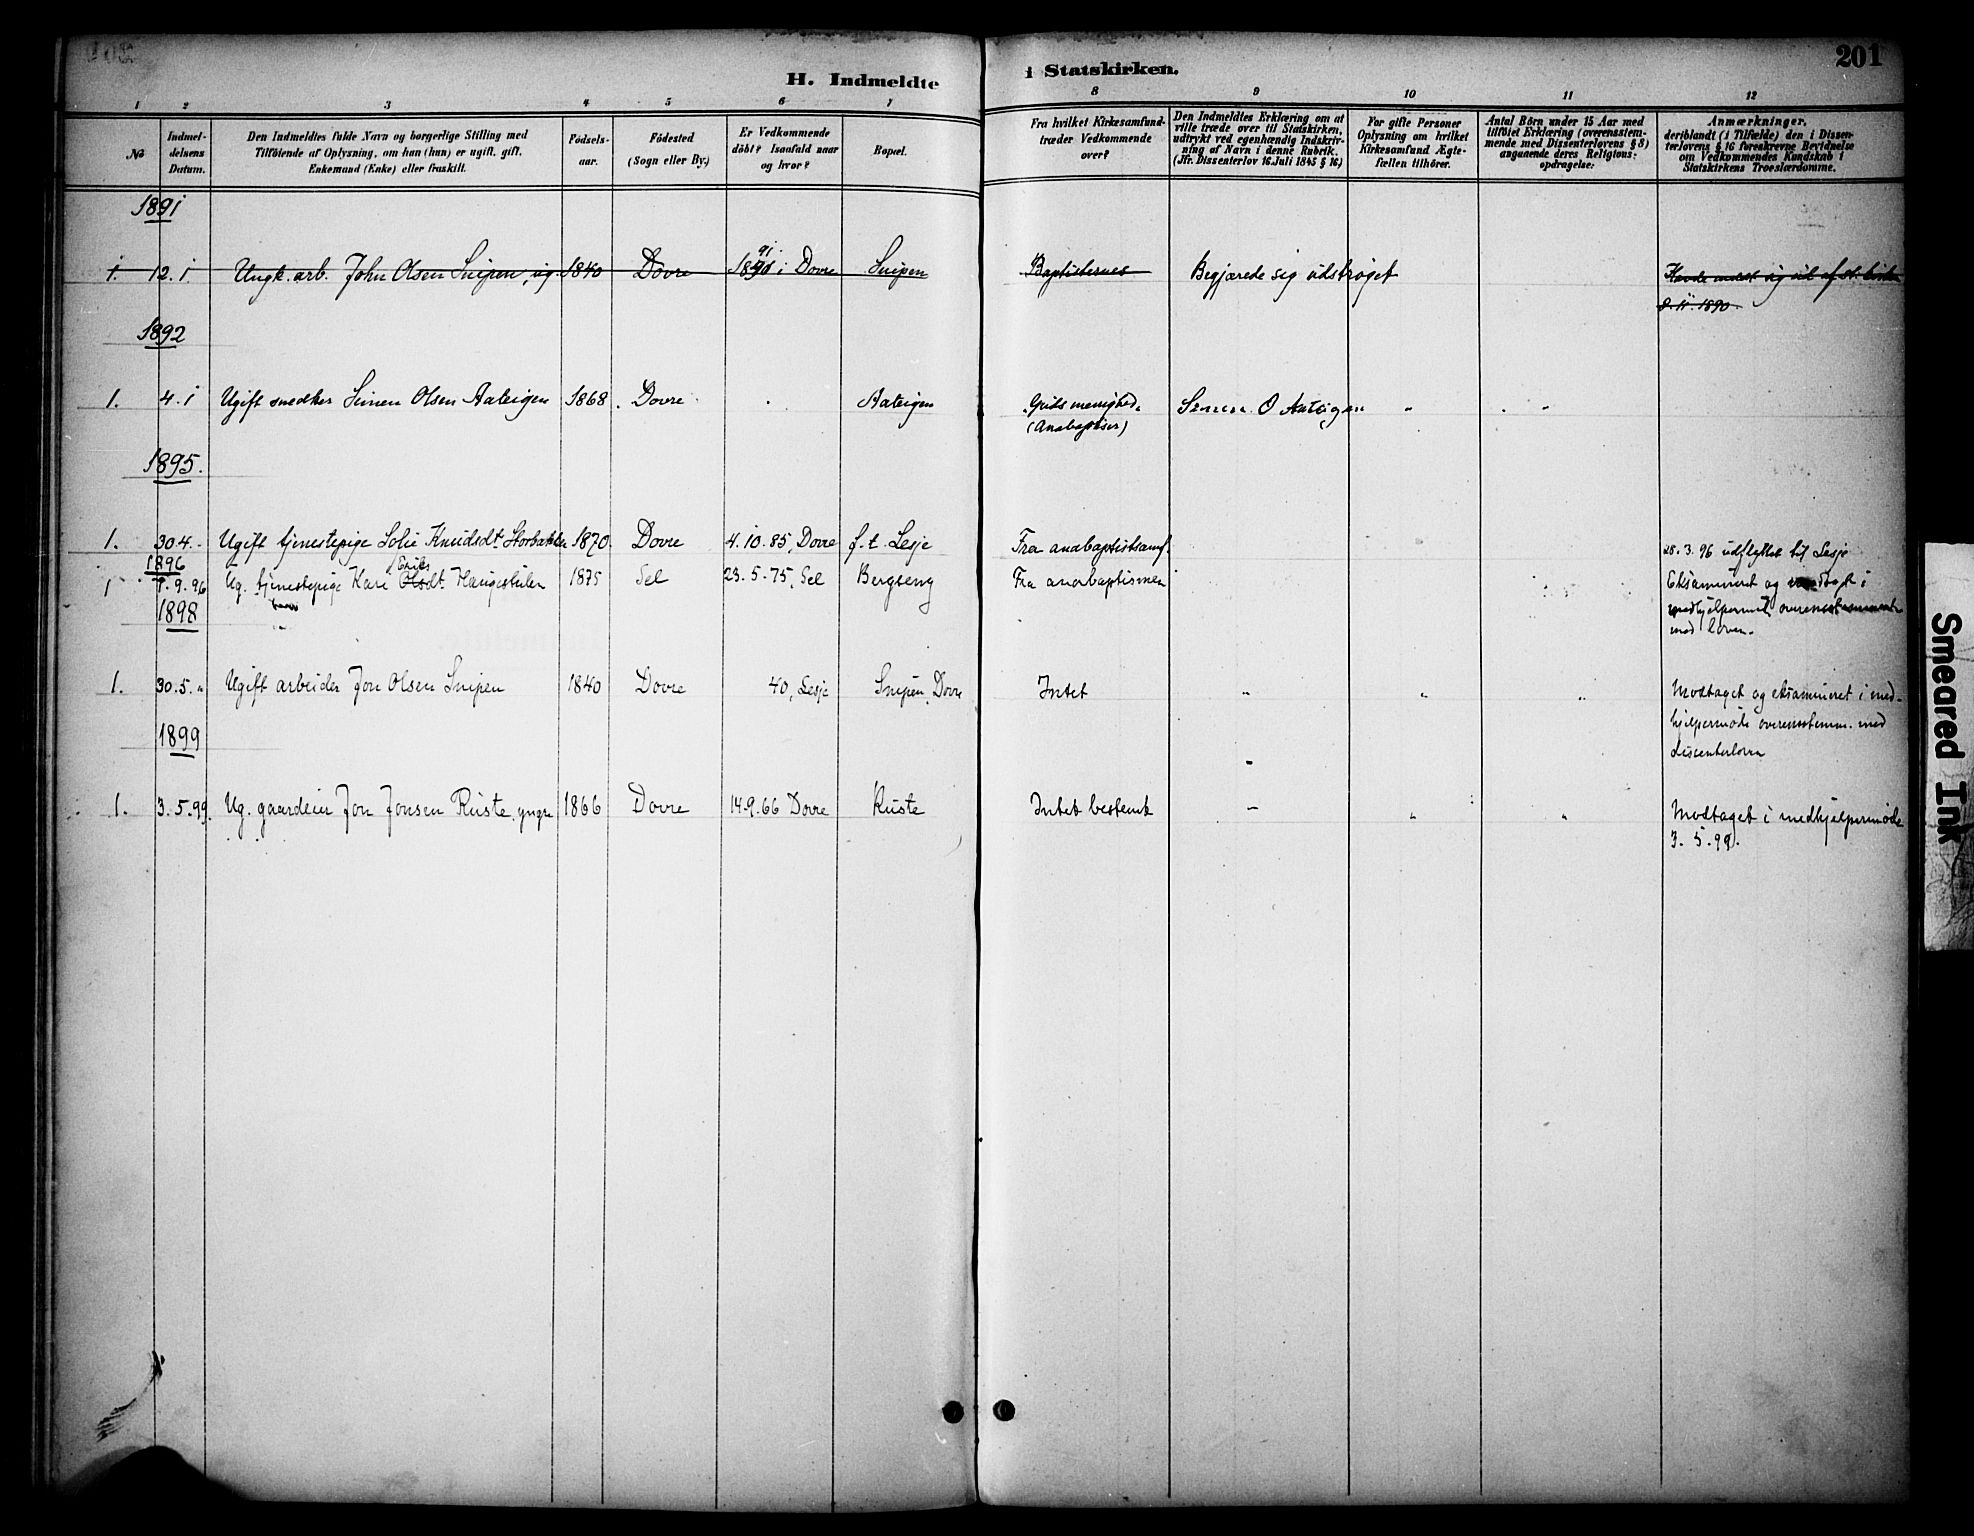 SAH, Dovre prestekontor, Ministerialbok nr. 3, 1891-1901, s. 201